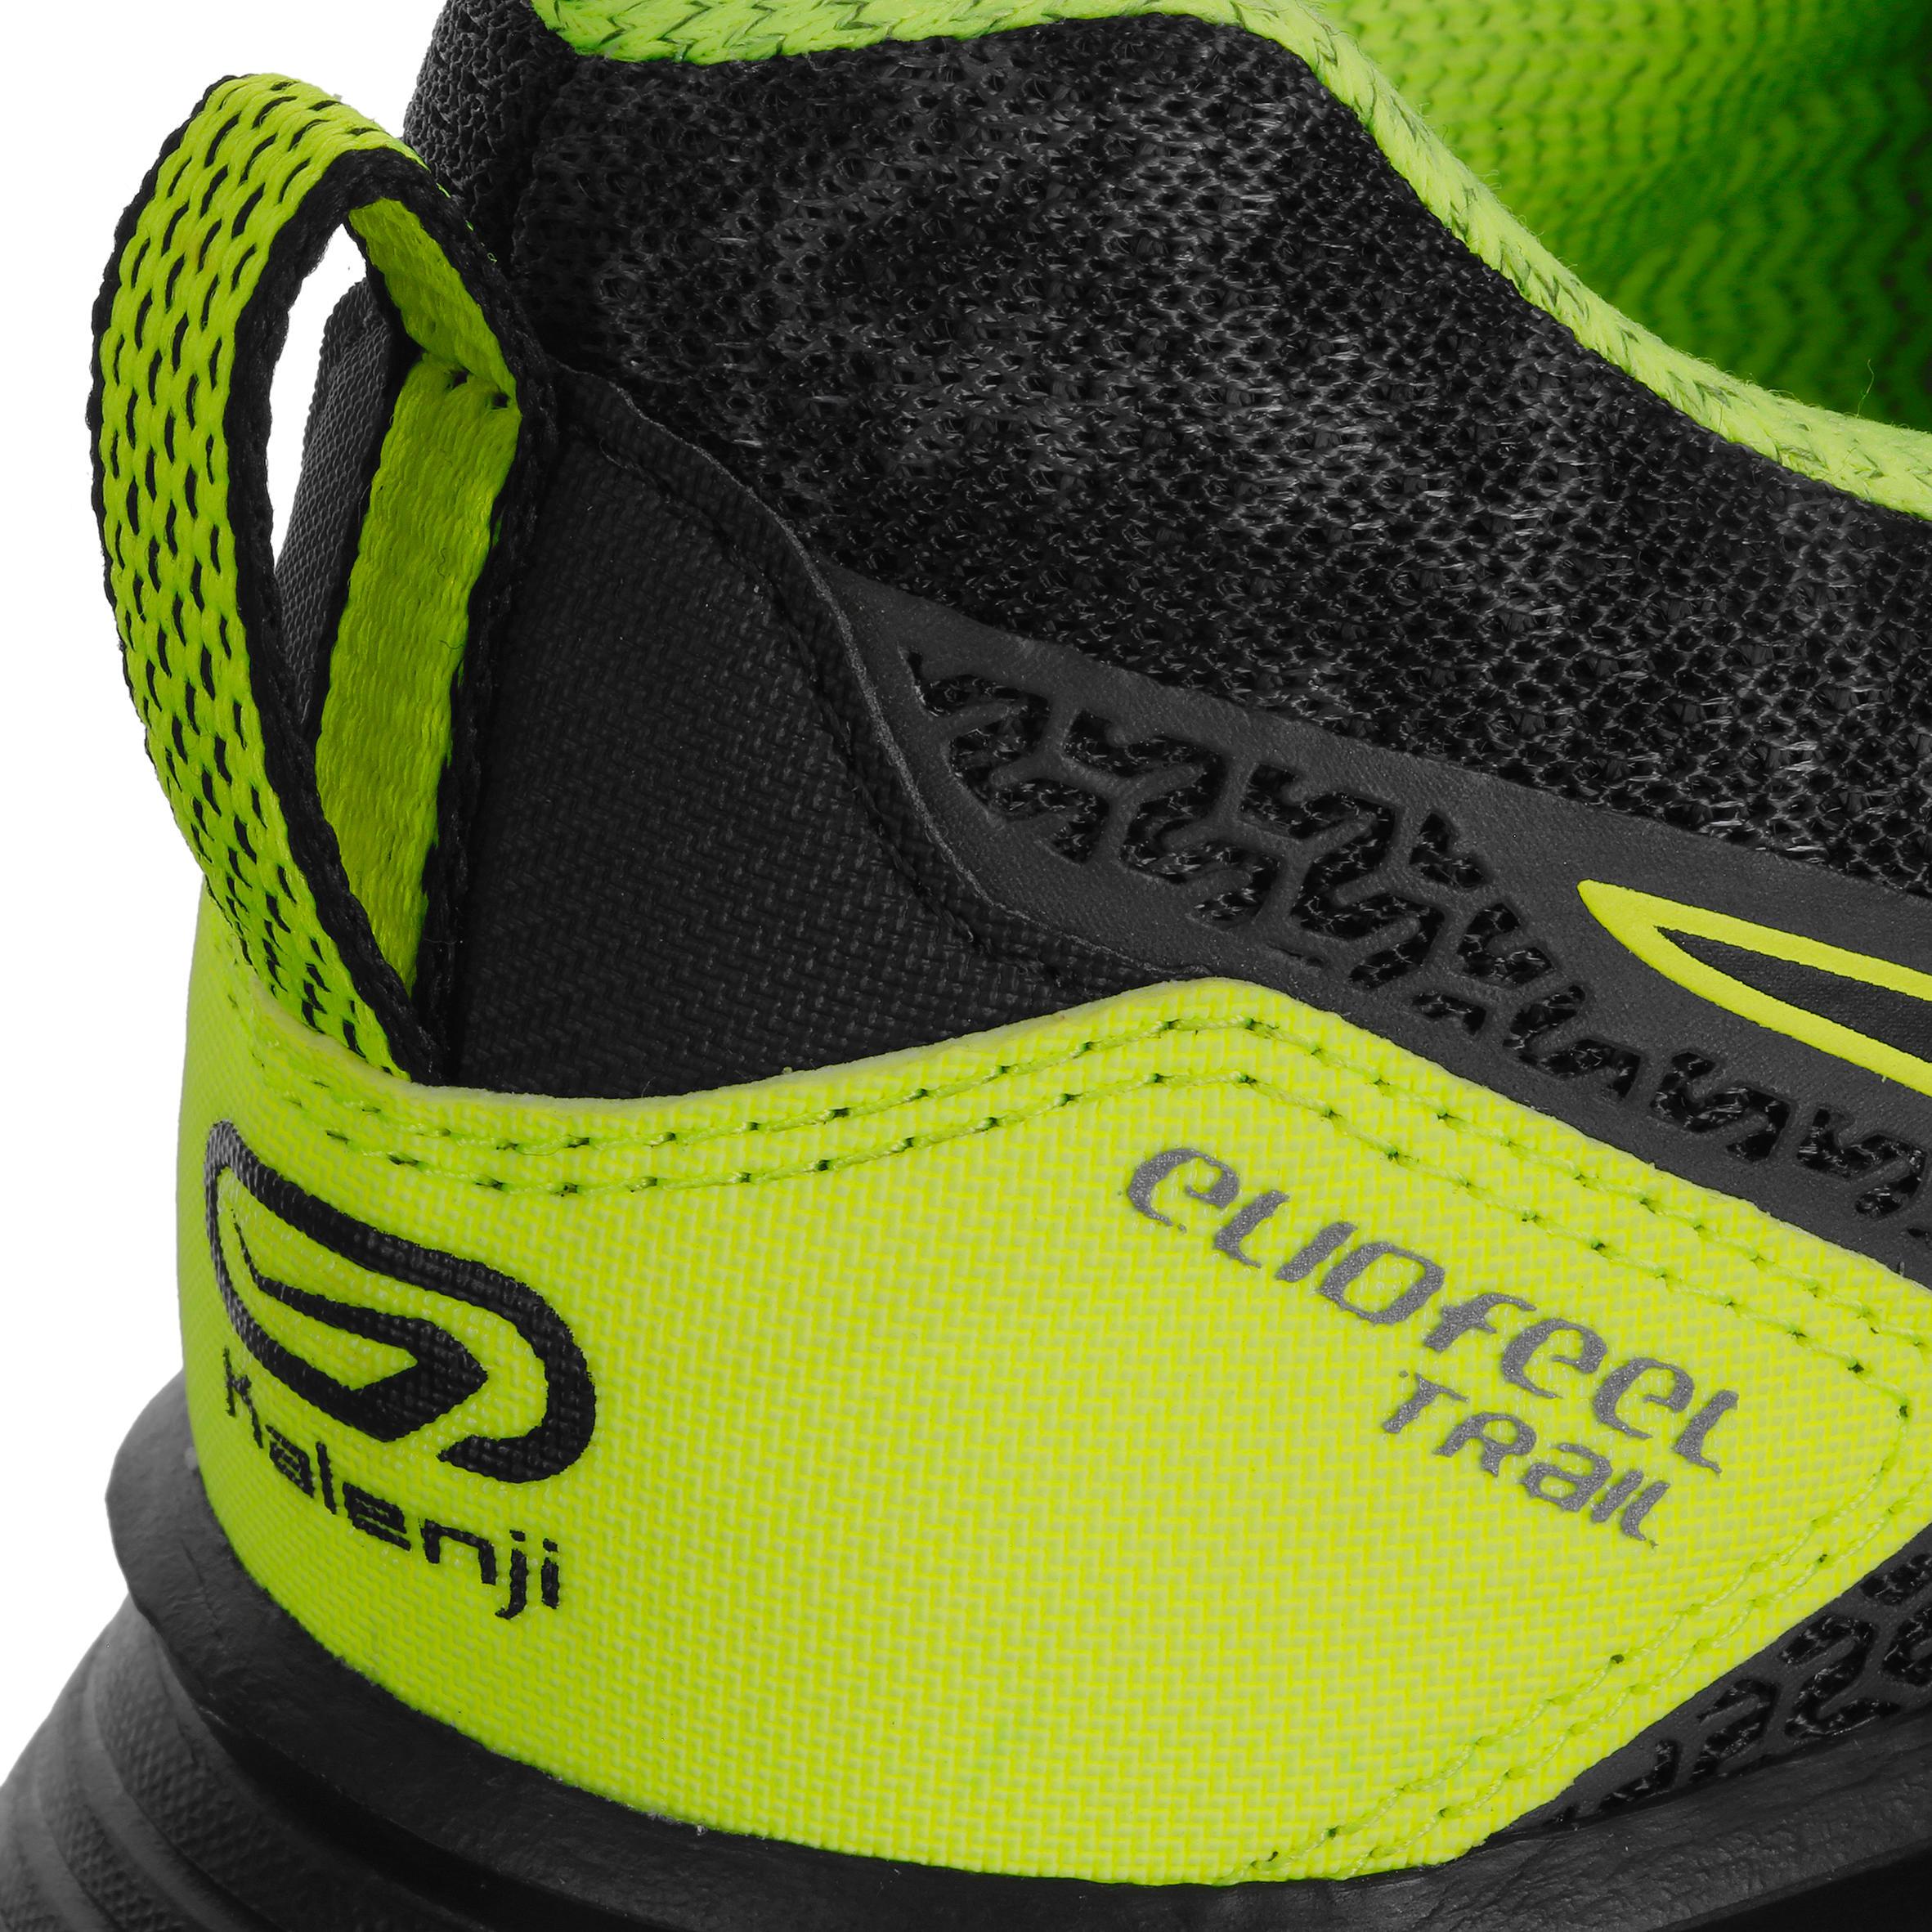 Homme Trail Chaussures Elio Running Feel Noir UVqpSGzML